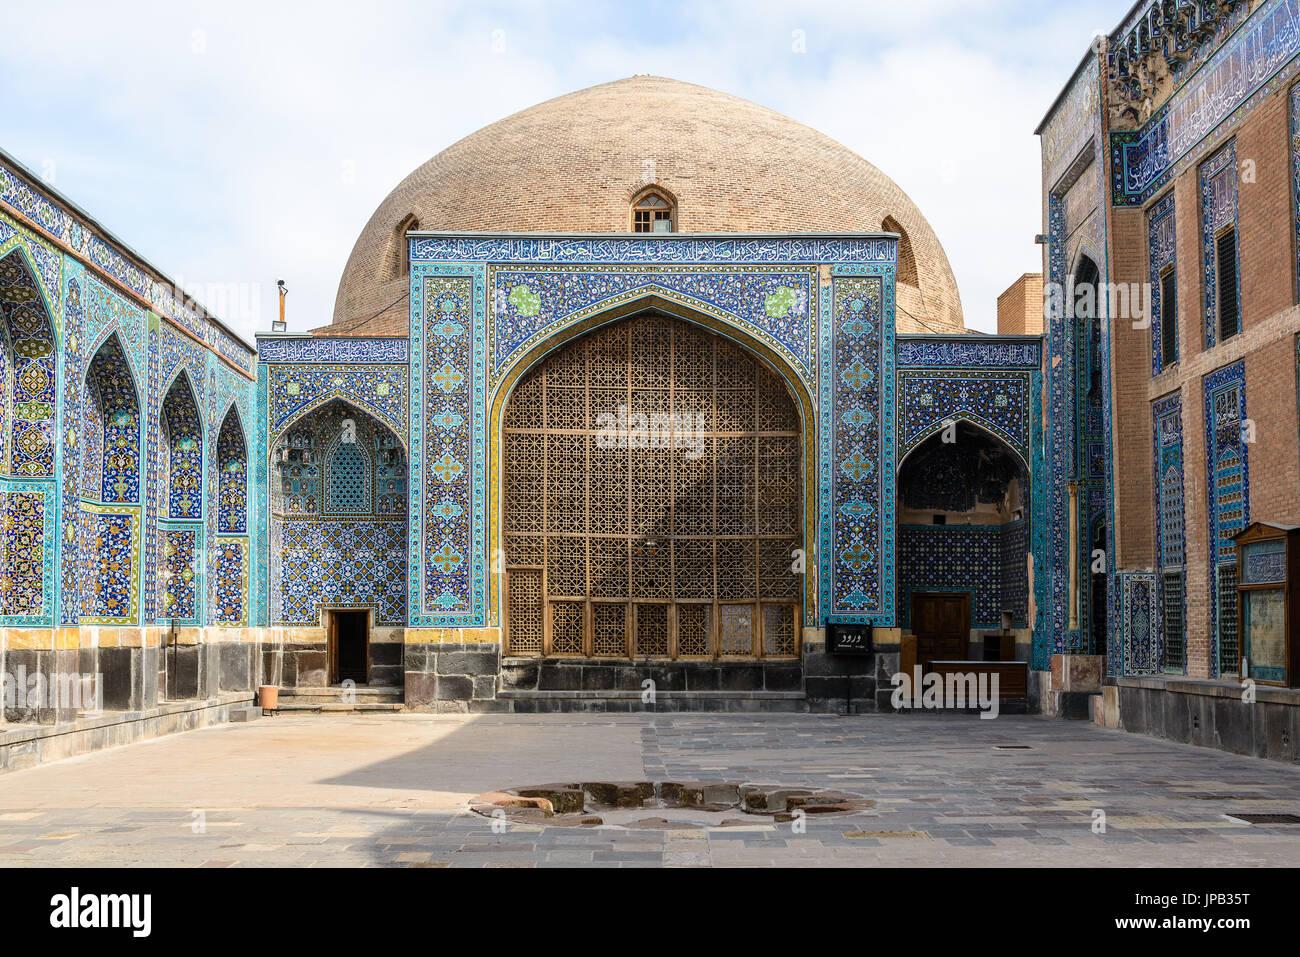 ARDABIL, IRAN - OCTOBER 09, 2014: Sheikh Sufi sanctuary - Stock Image